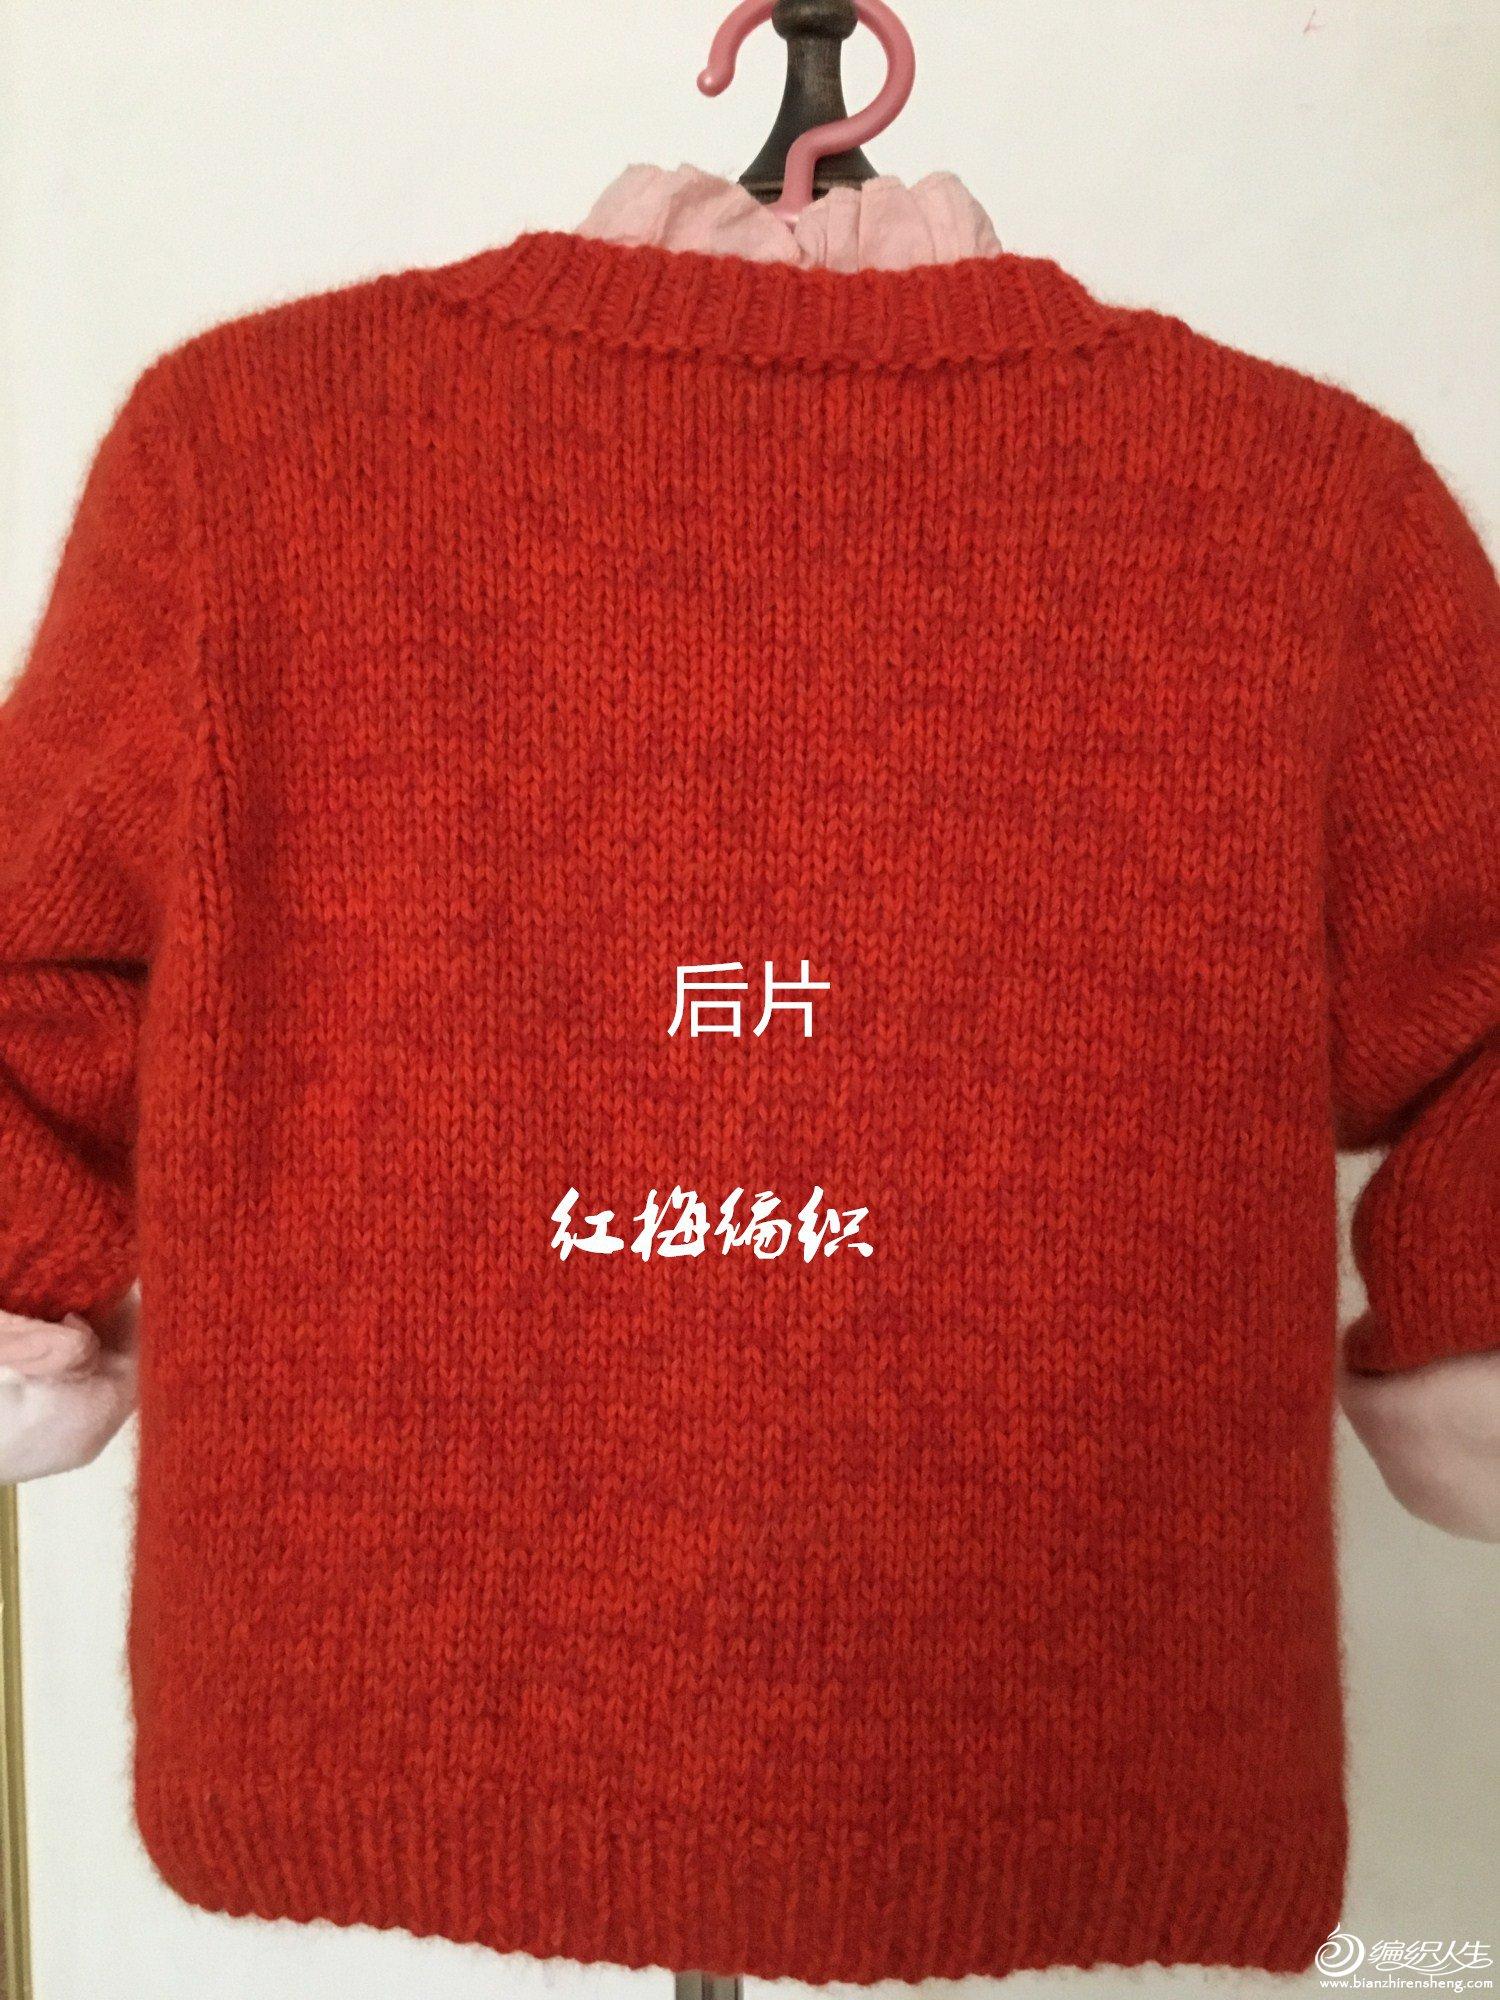 IMG_2258_副本.jpg